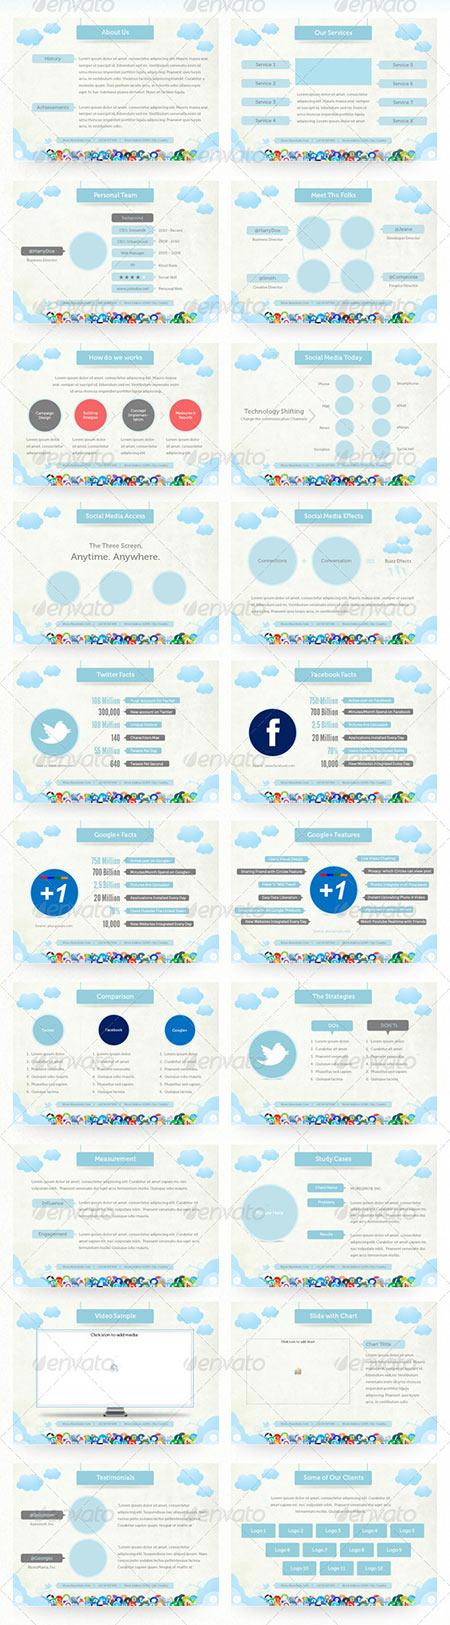 social media presentation دانلود قالب پاور پوینت با تم شبکه های اجتماعی و افکت های زیبا